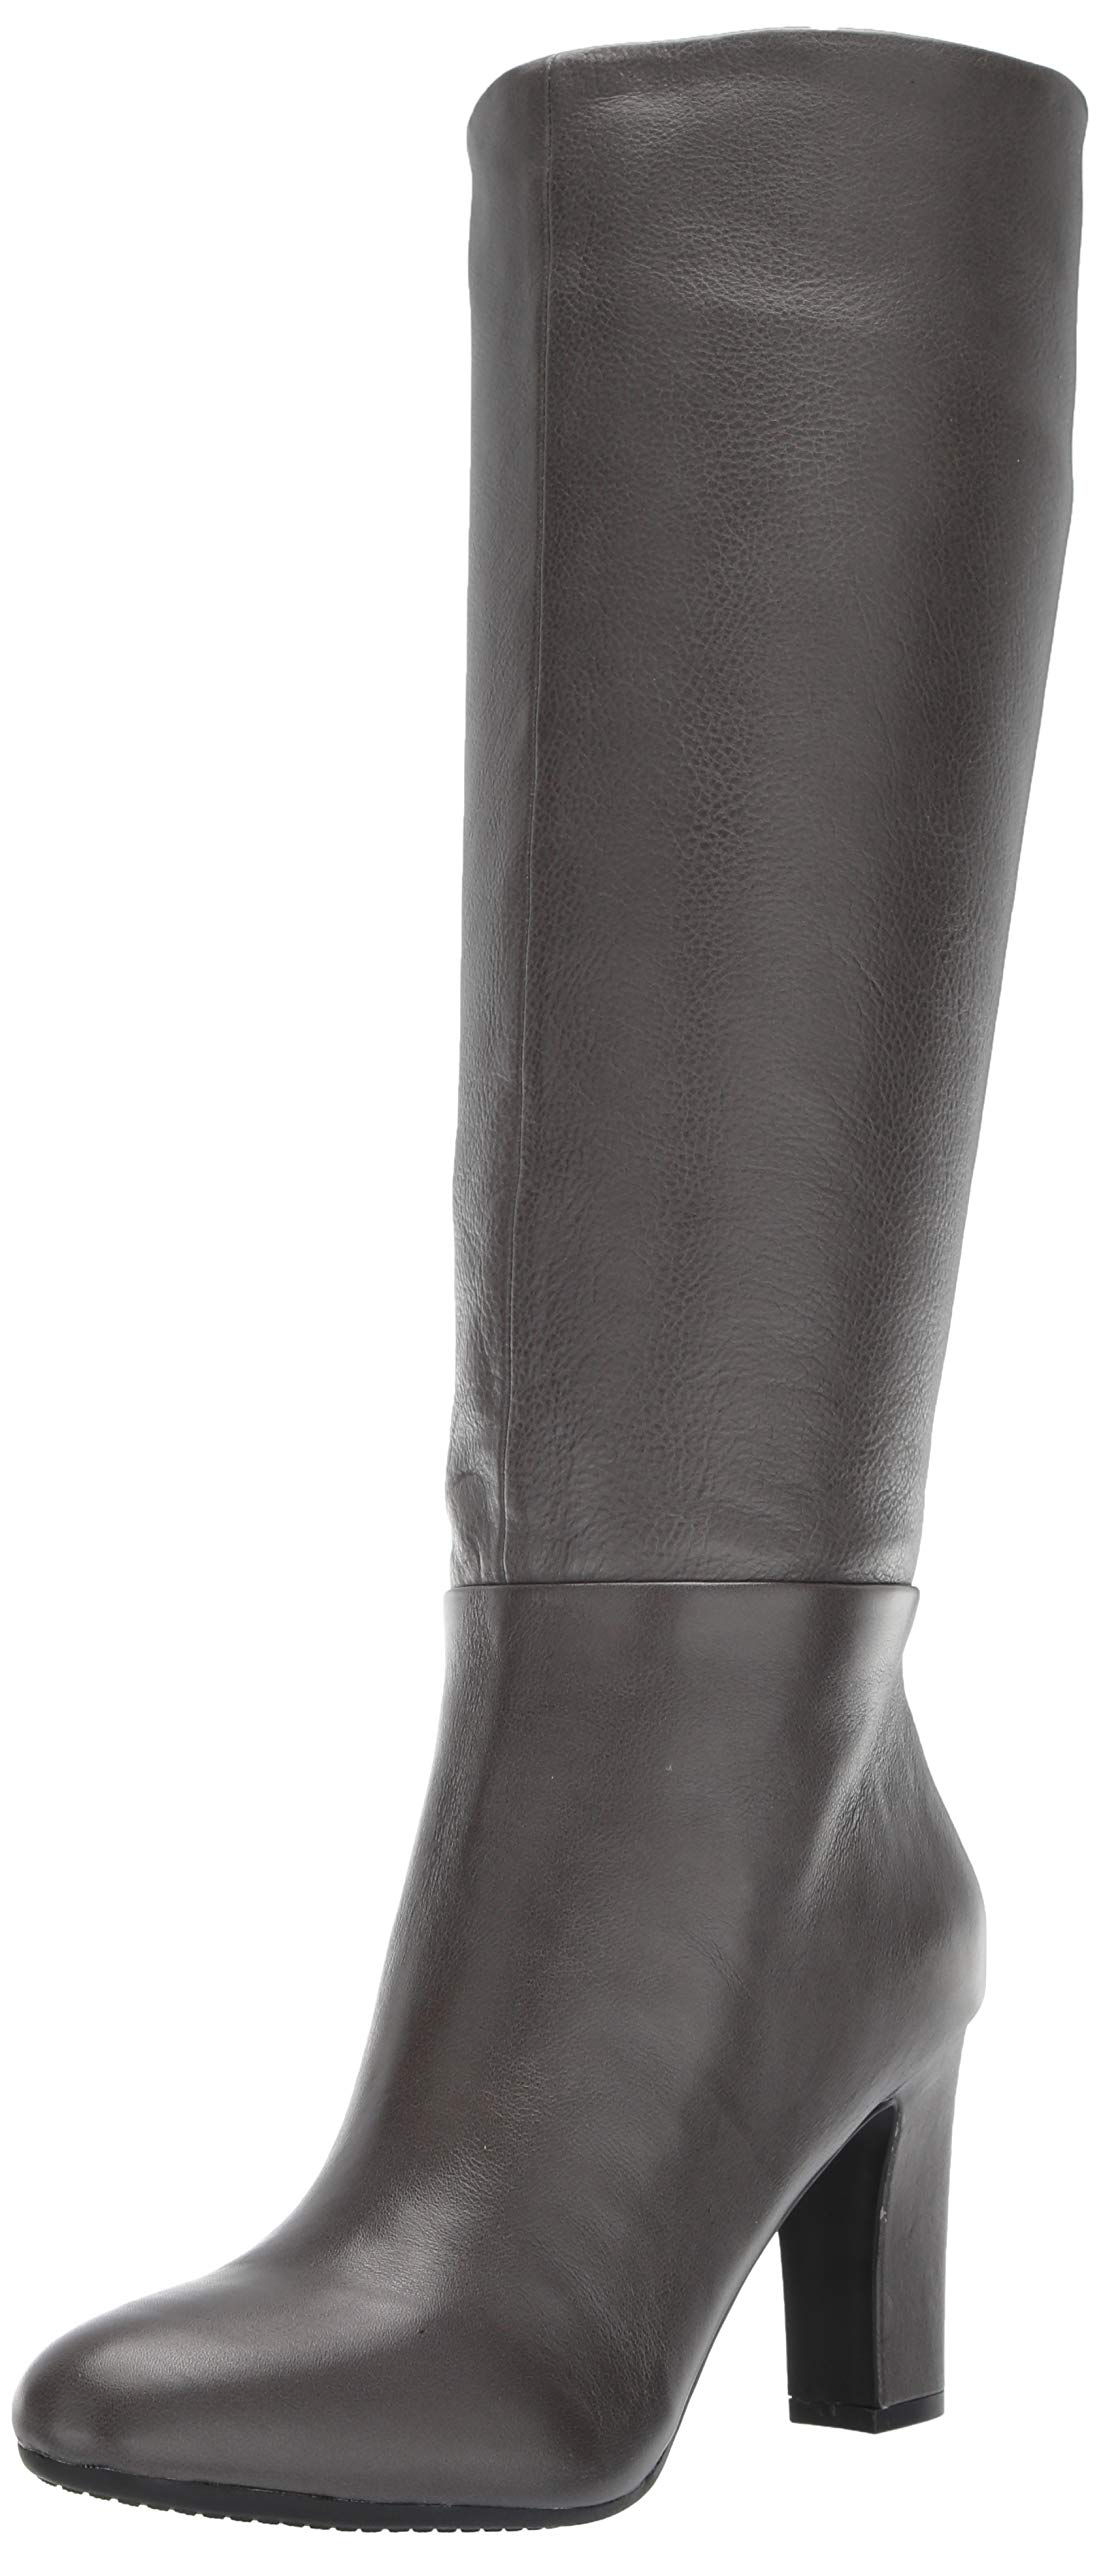 Aerosoles Women's Hashtag Knee High Boot, Grey Leather, 9 M US by Aerosoles